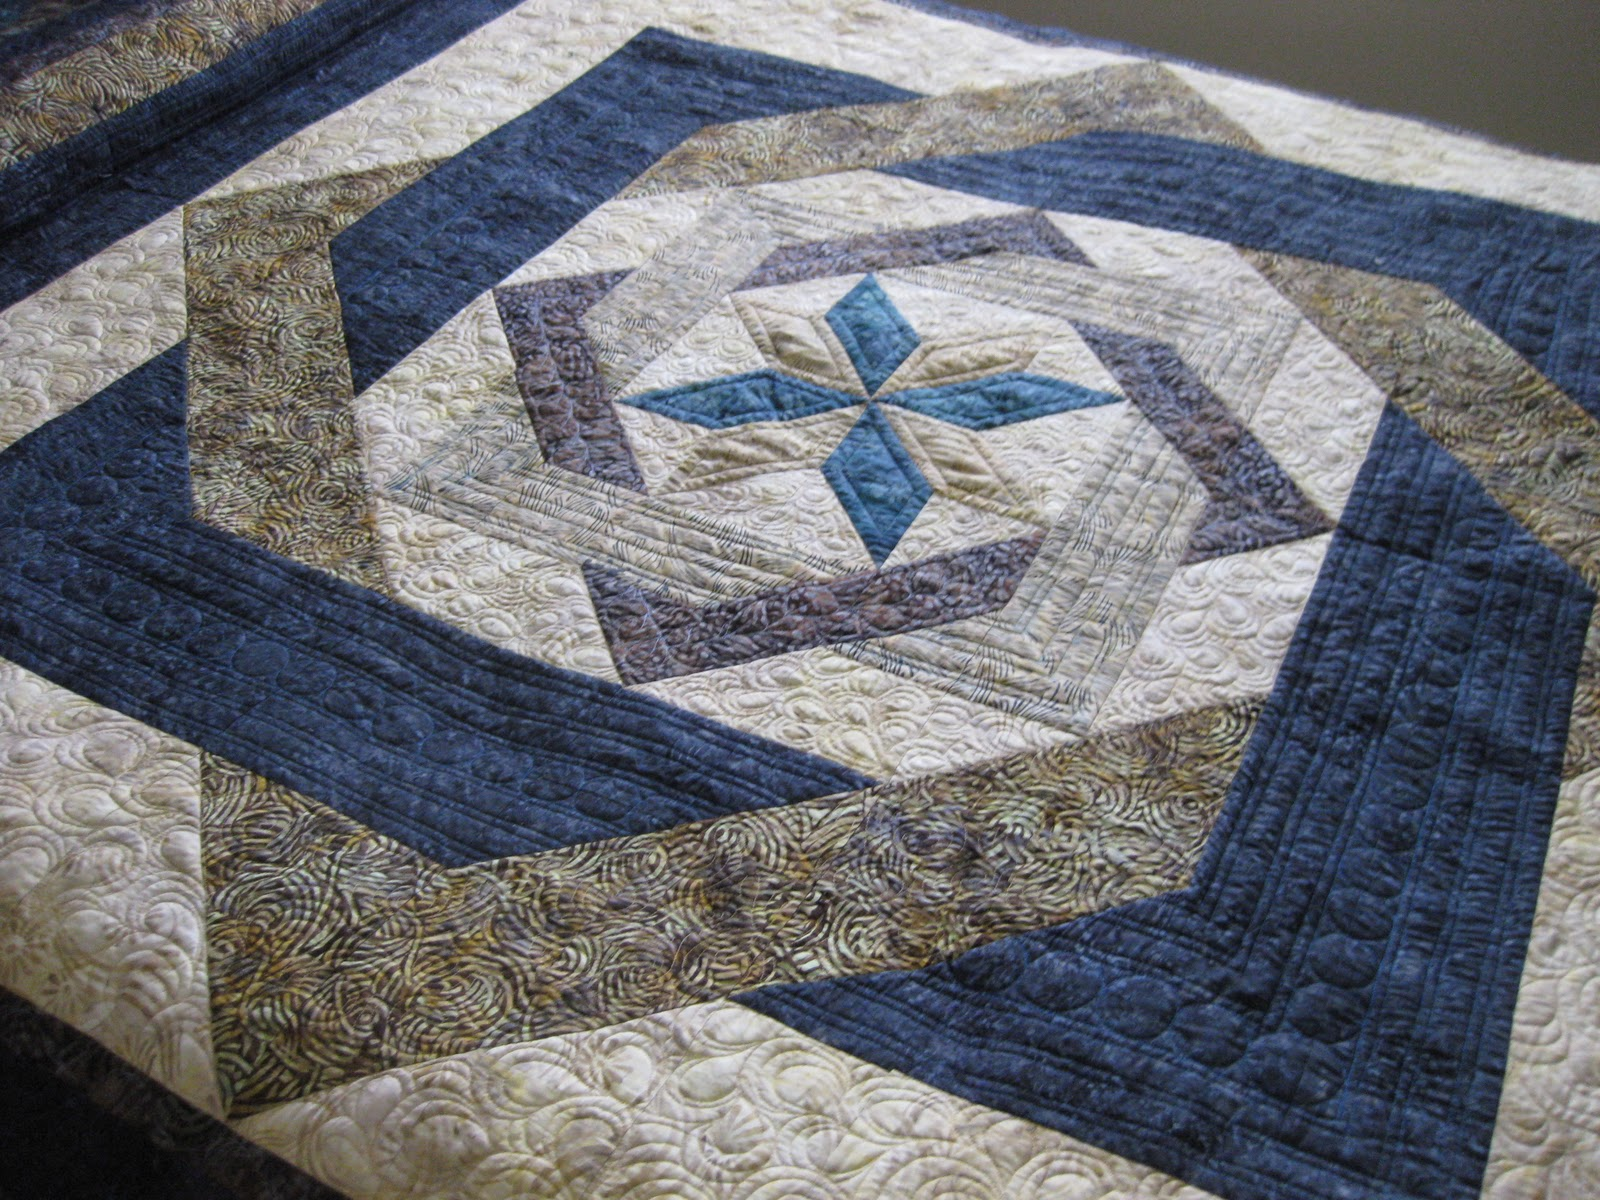 Labyrinth Quilt Pattern Free Download : Joan at Leschenault: Labyrinth Quilt - FMQ